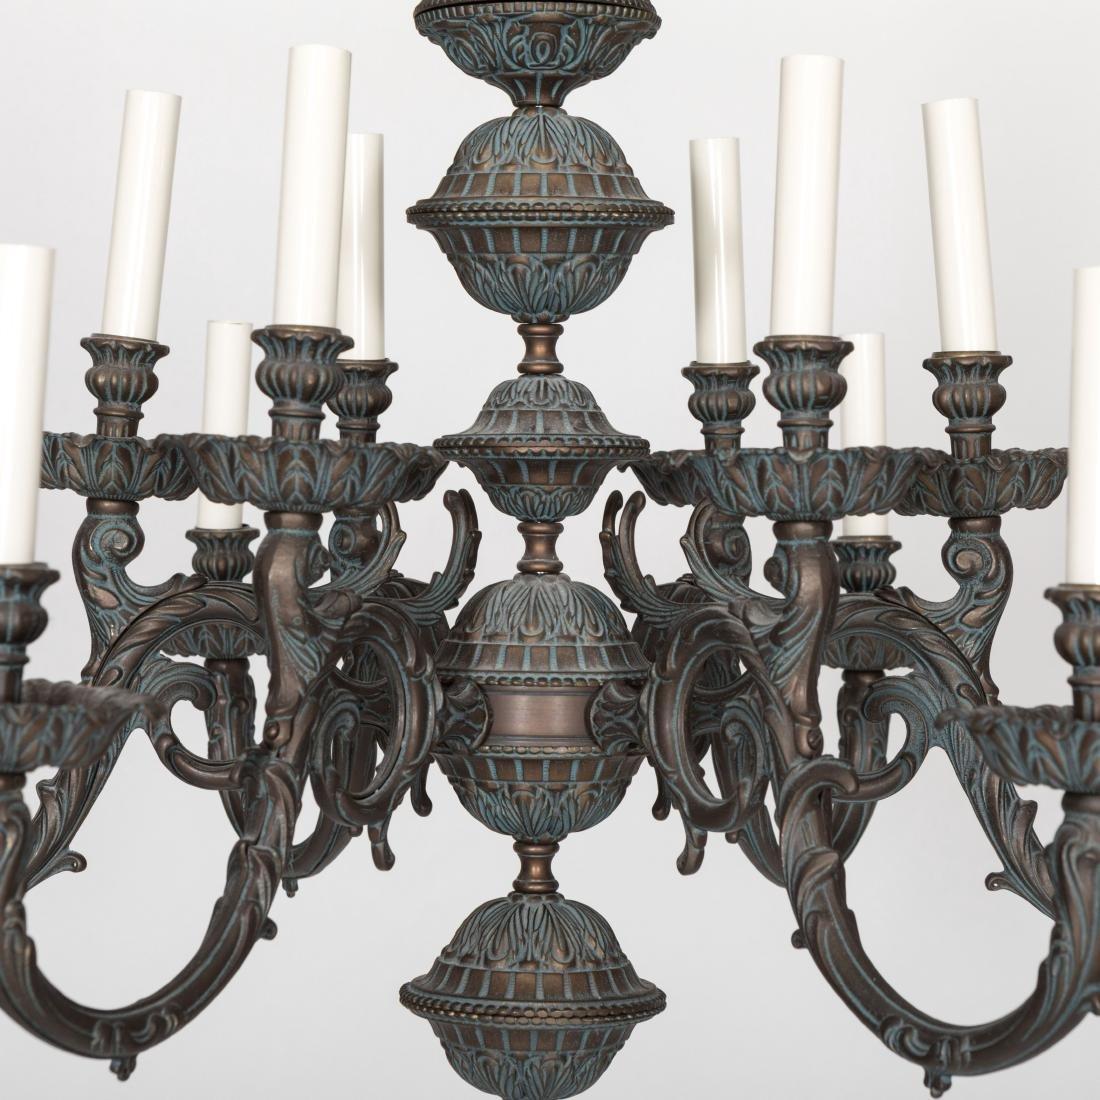 Rococo Style Iron Chandelier - 4